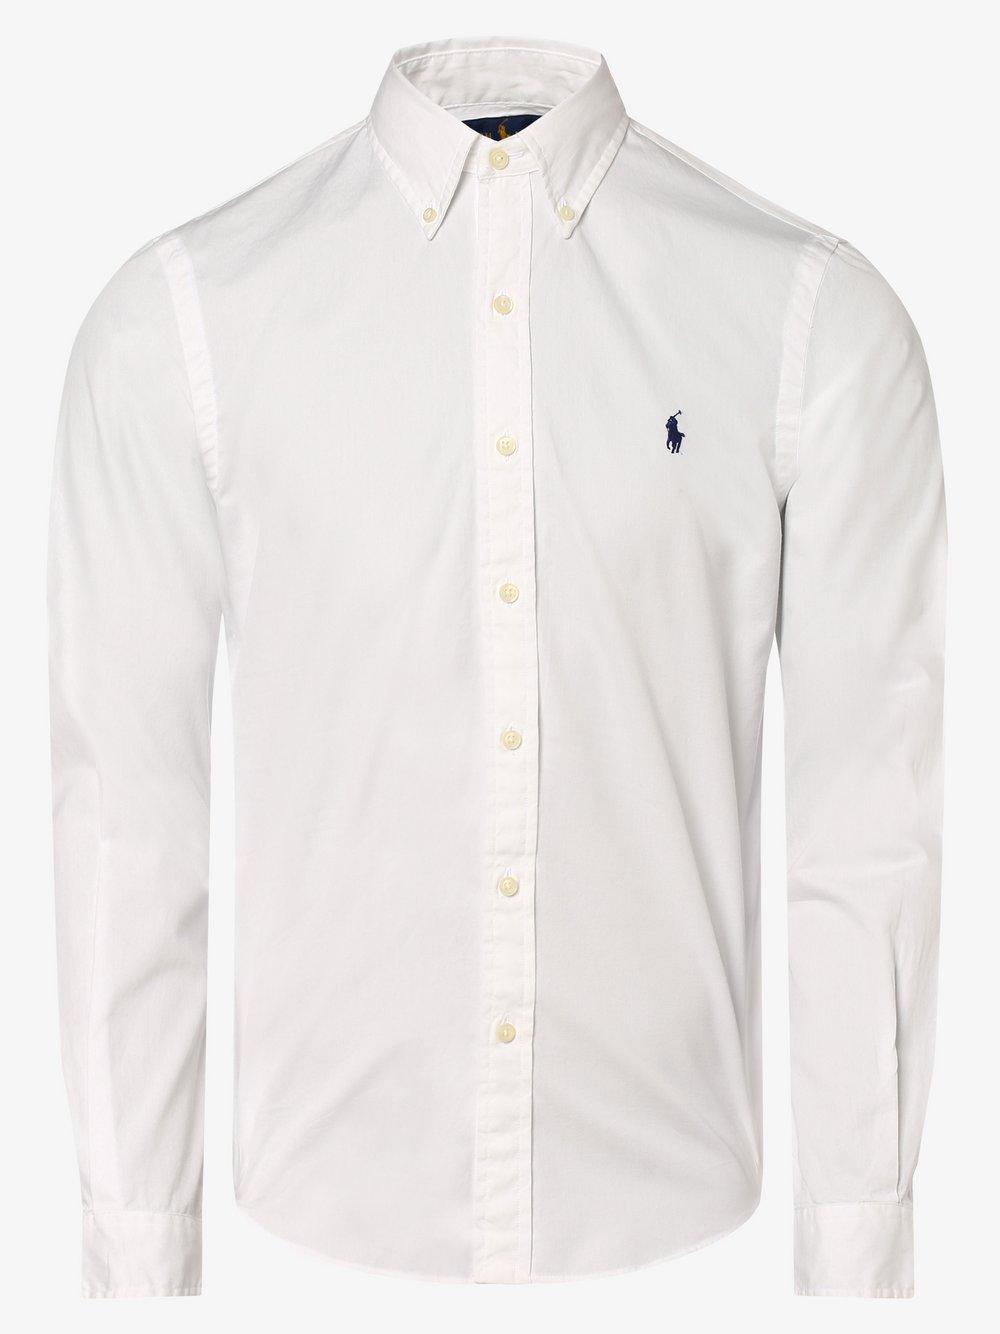 Polo Ralph Lauren - Koszula męska – Slim Fit, biały